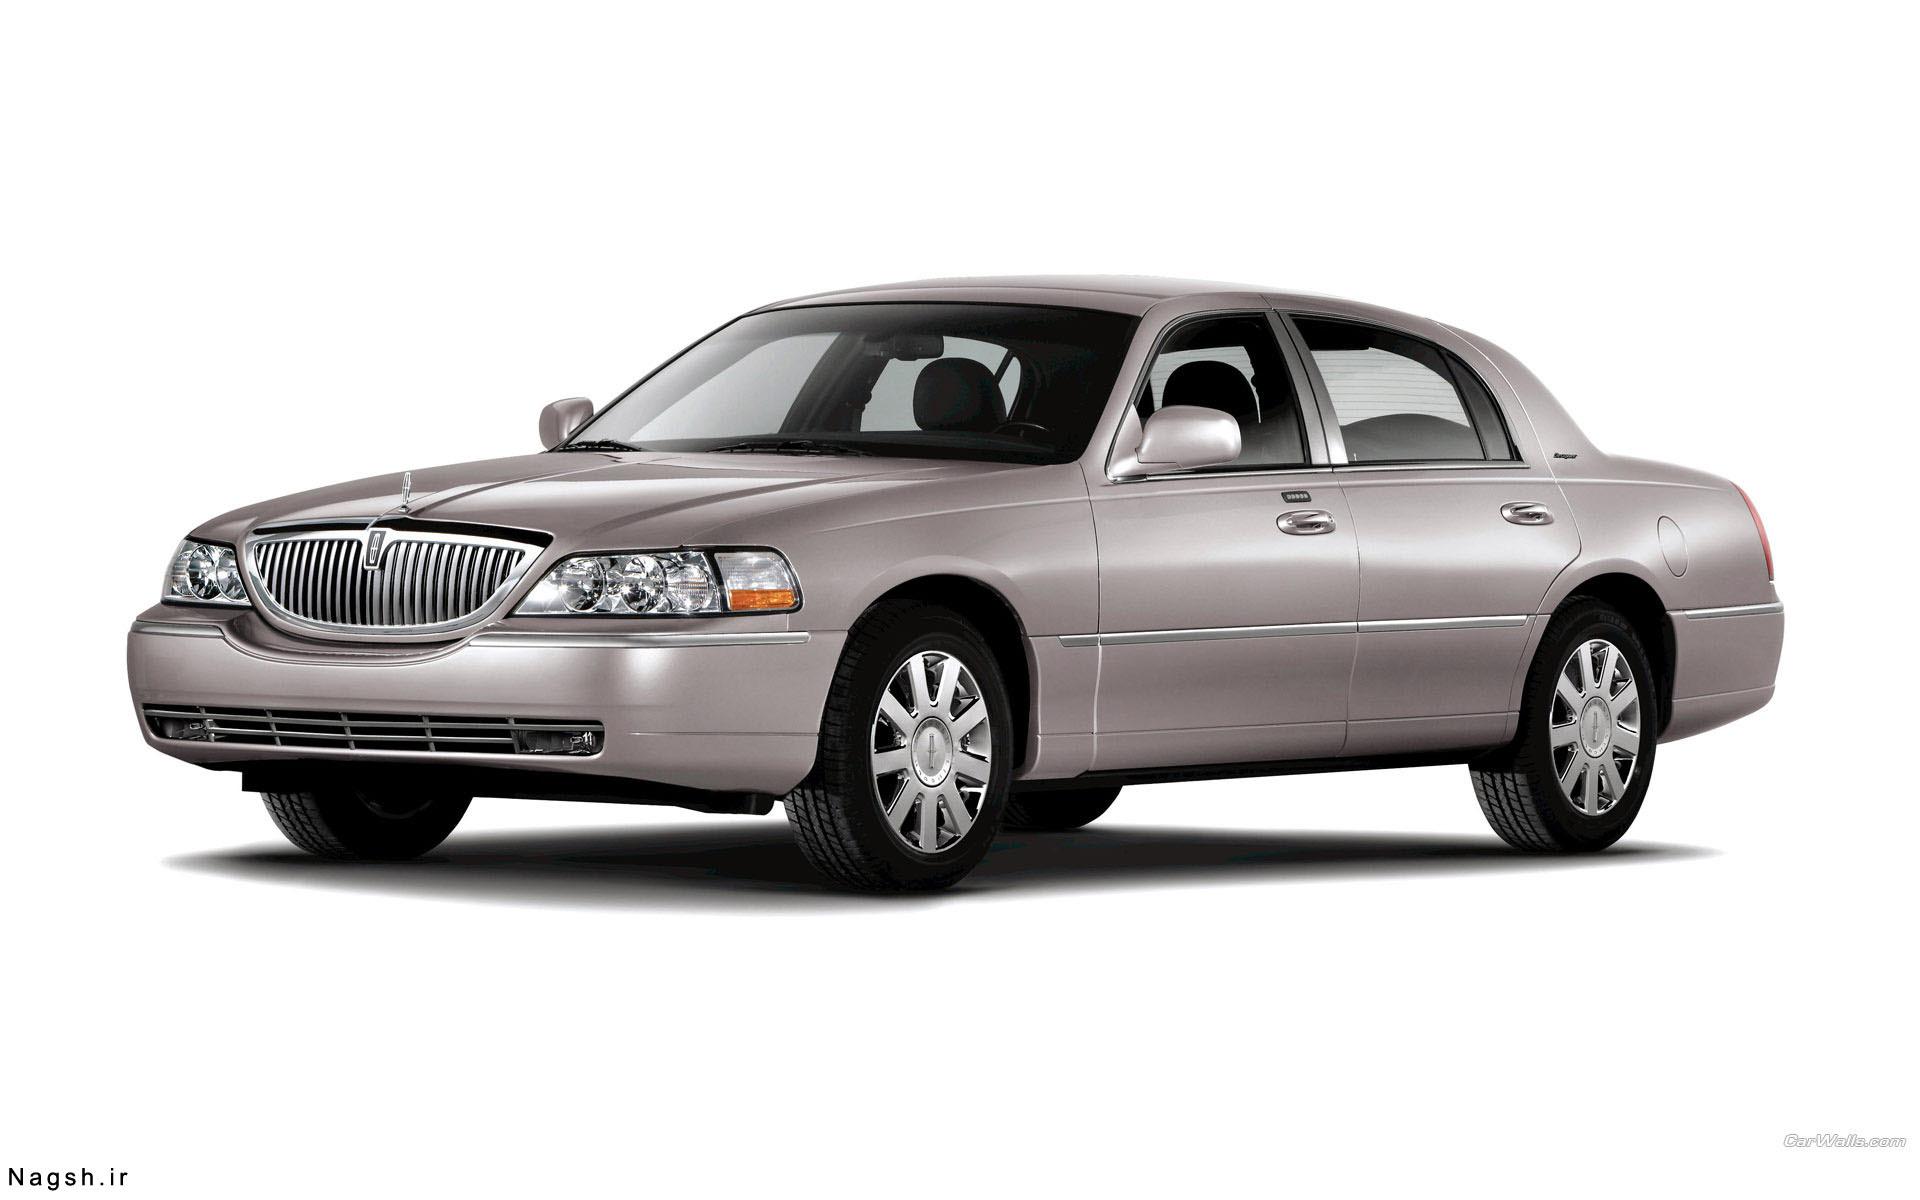 تصویر بک گراند سفید ماشین لینکولین